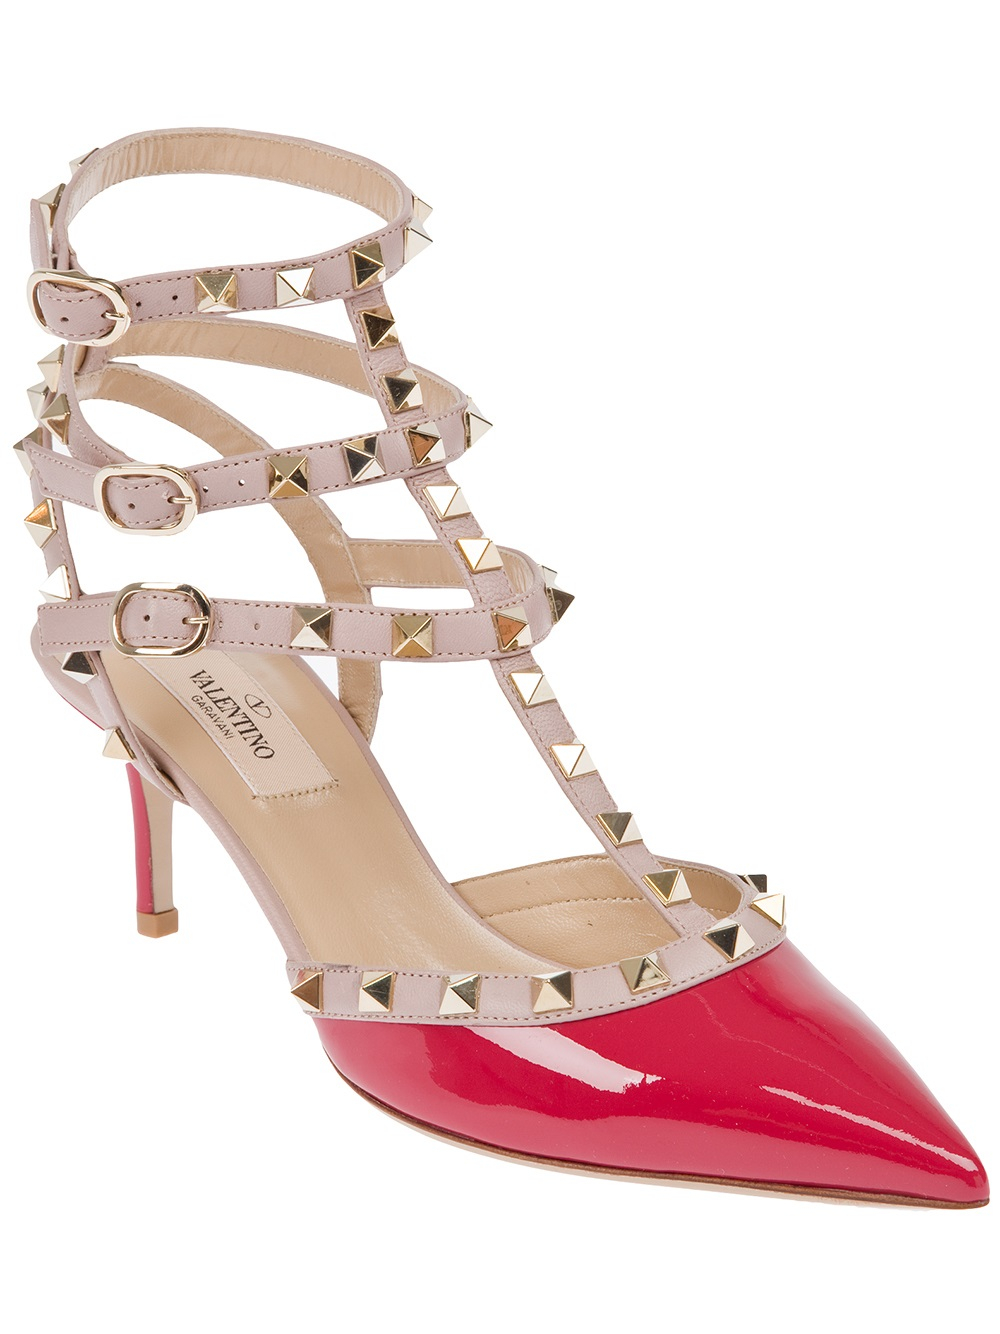 Valentino Garavani Rockstud ankle strap pumps - Pink & Purple Valentino yhGcc77sJ